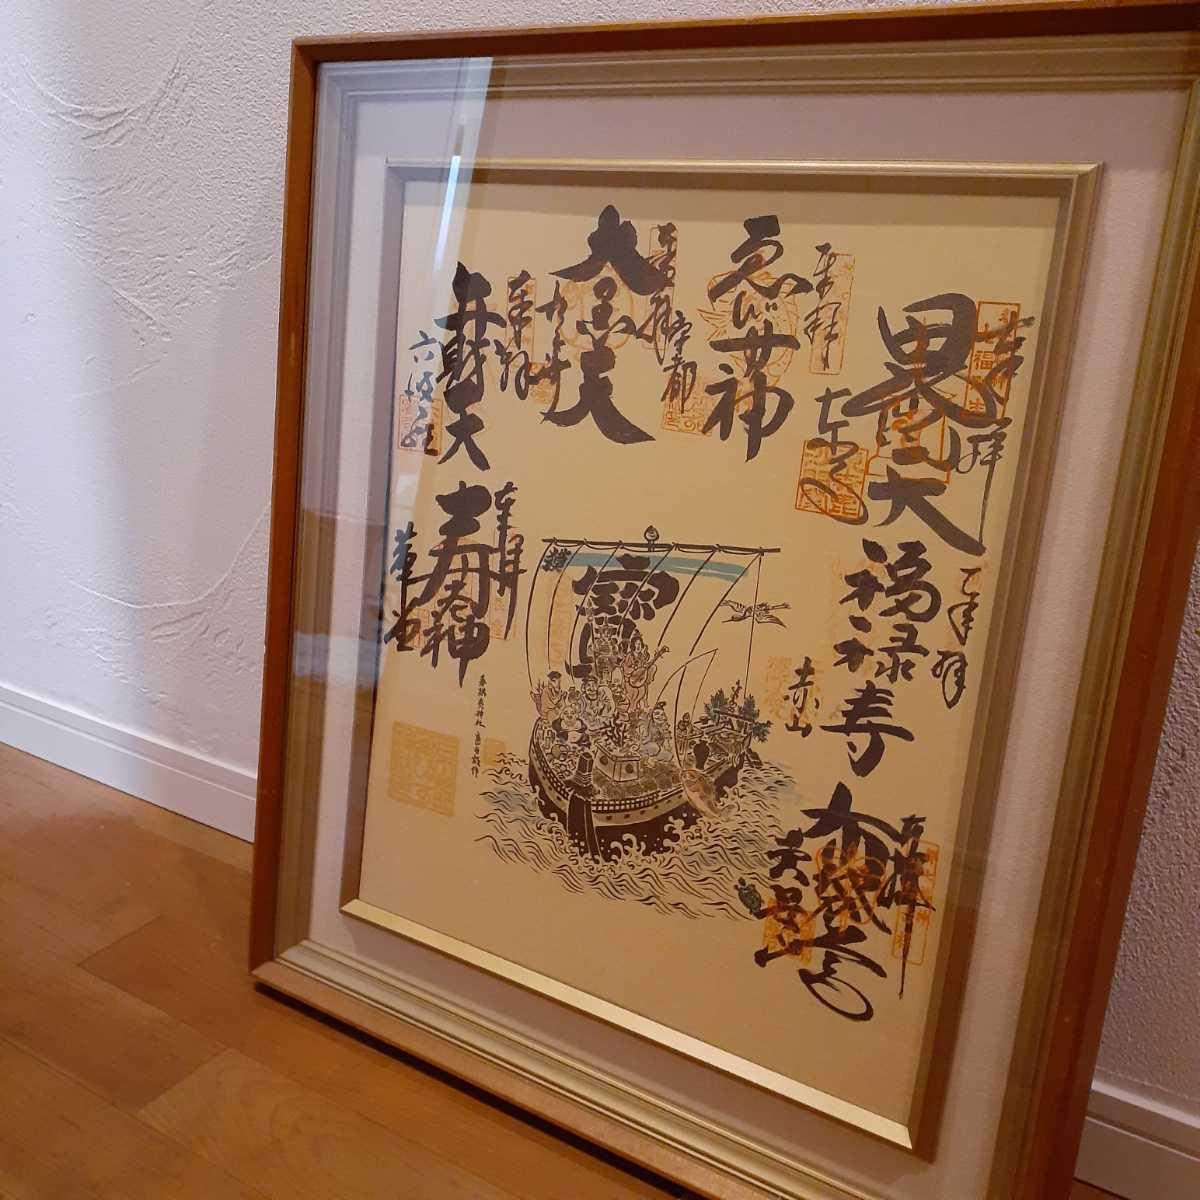 ◆幸◆徳力富吉郎 七福神 京都えびす神社 約52cm ×61cm×3.3cm